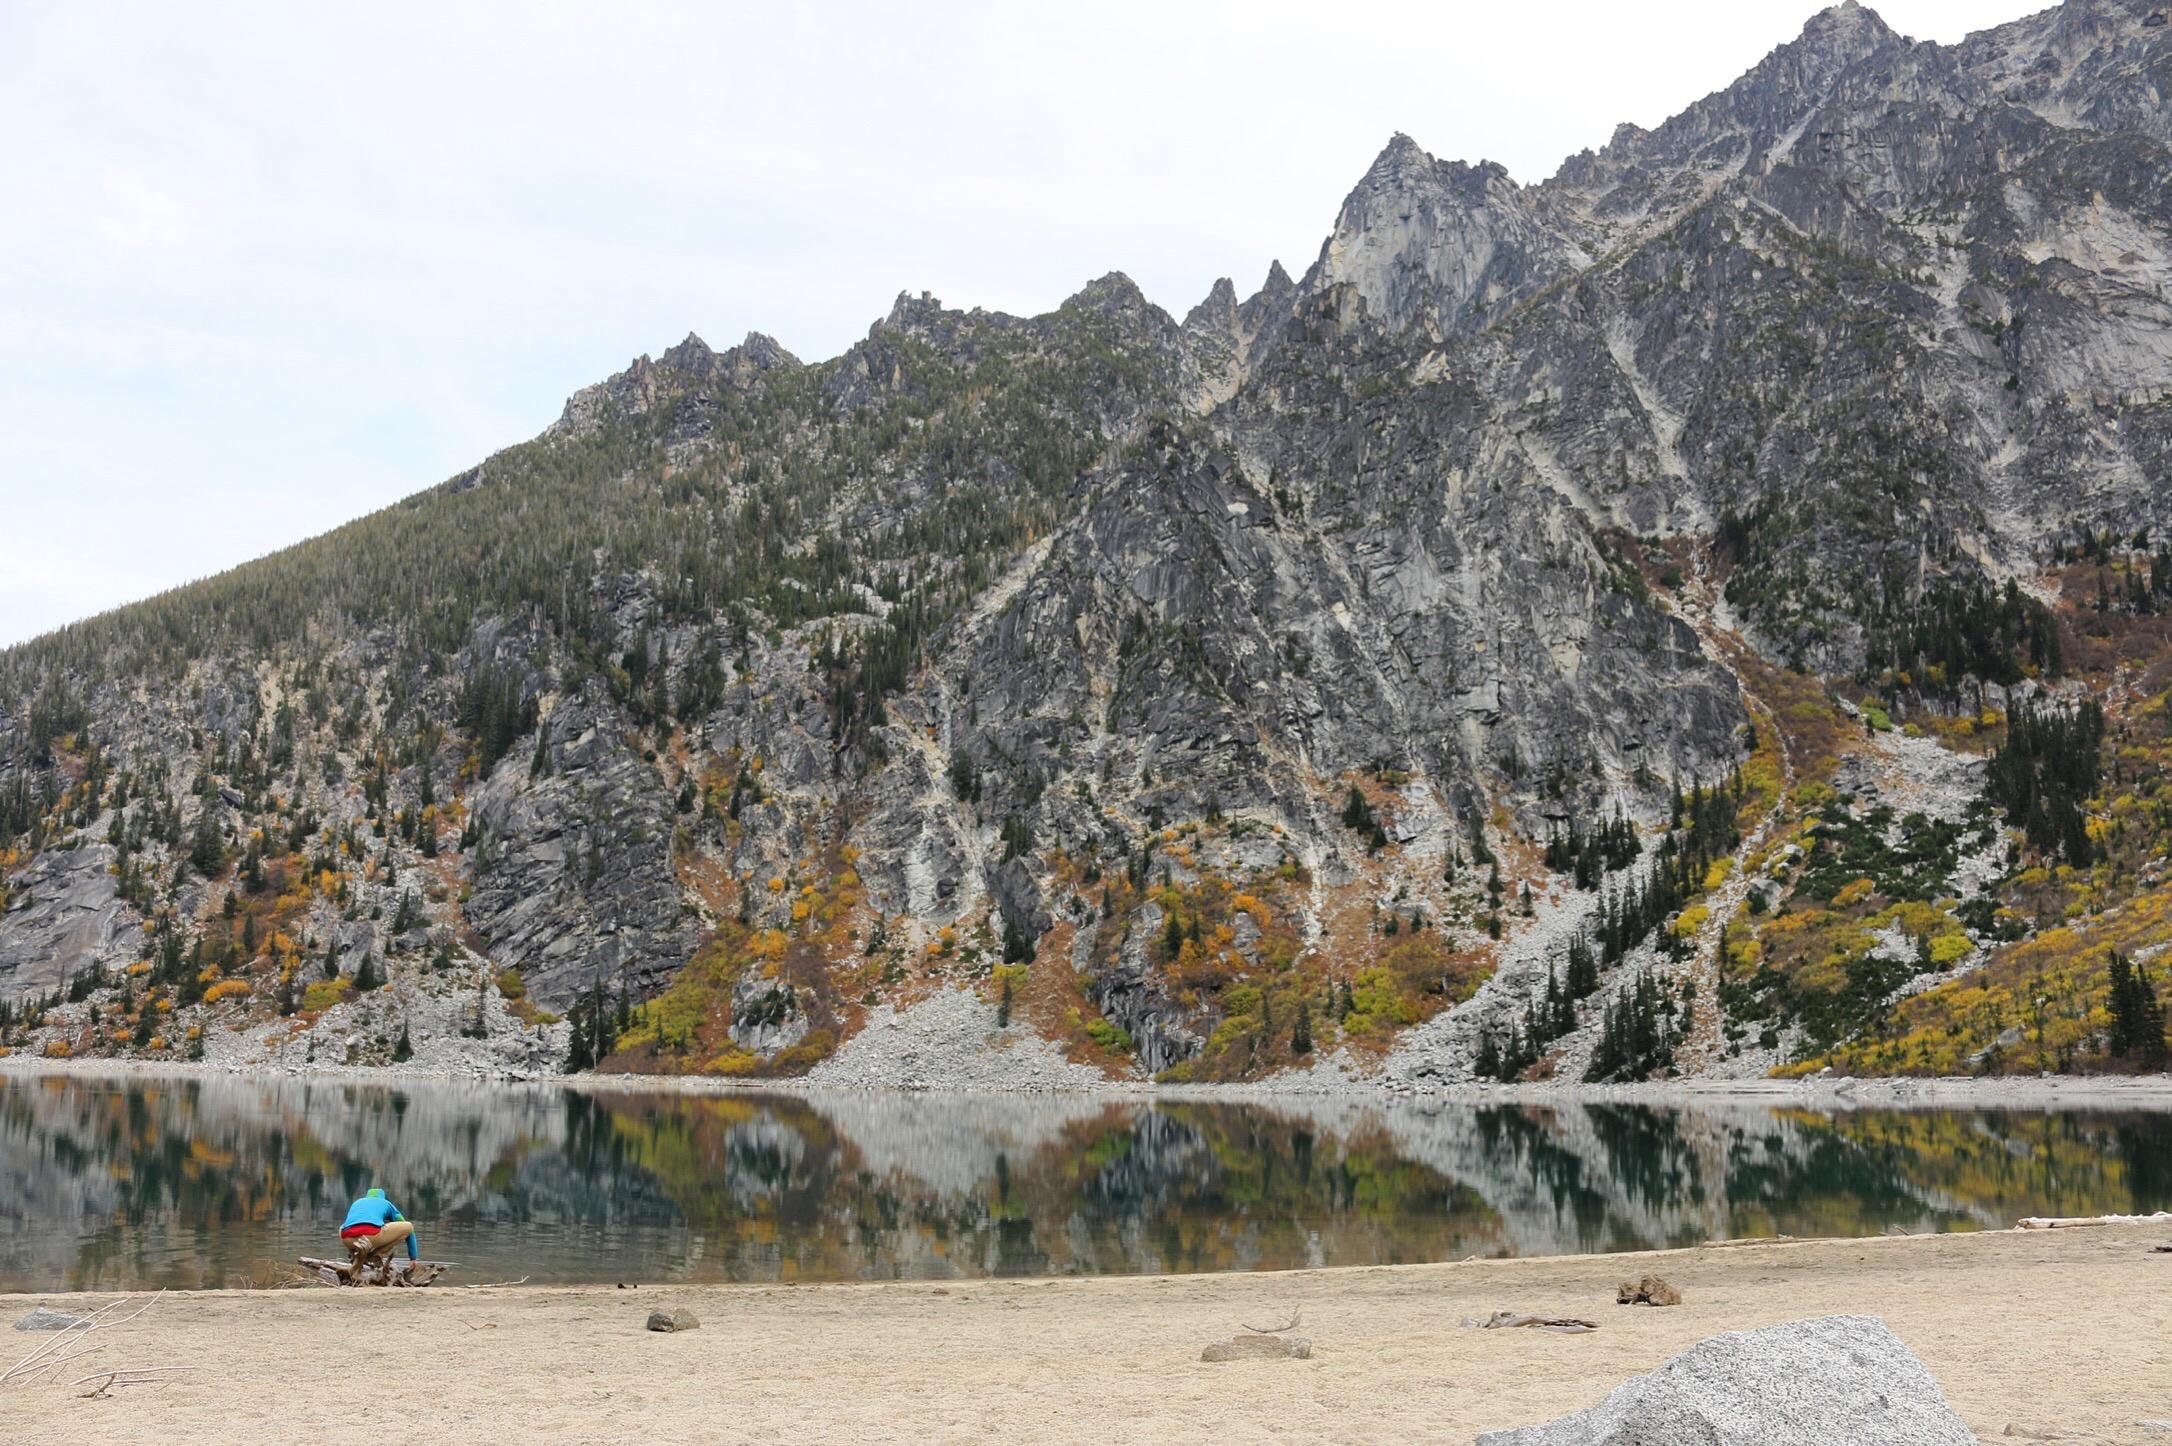 Fall camping at Colchuck Lake before hiking to The Enchatnments